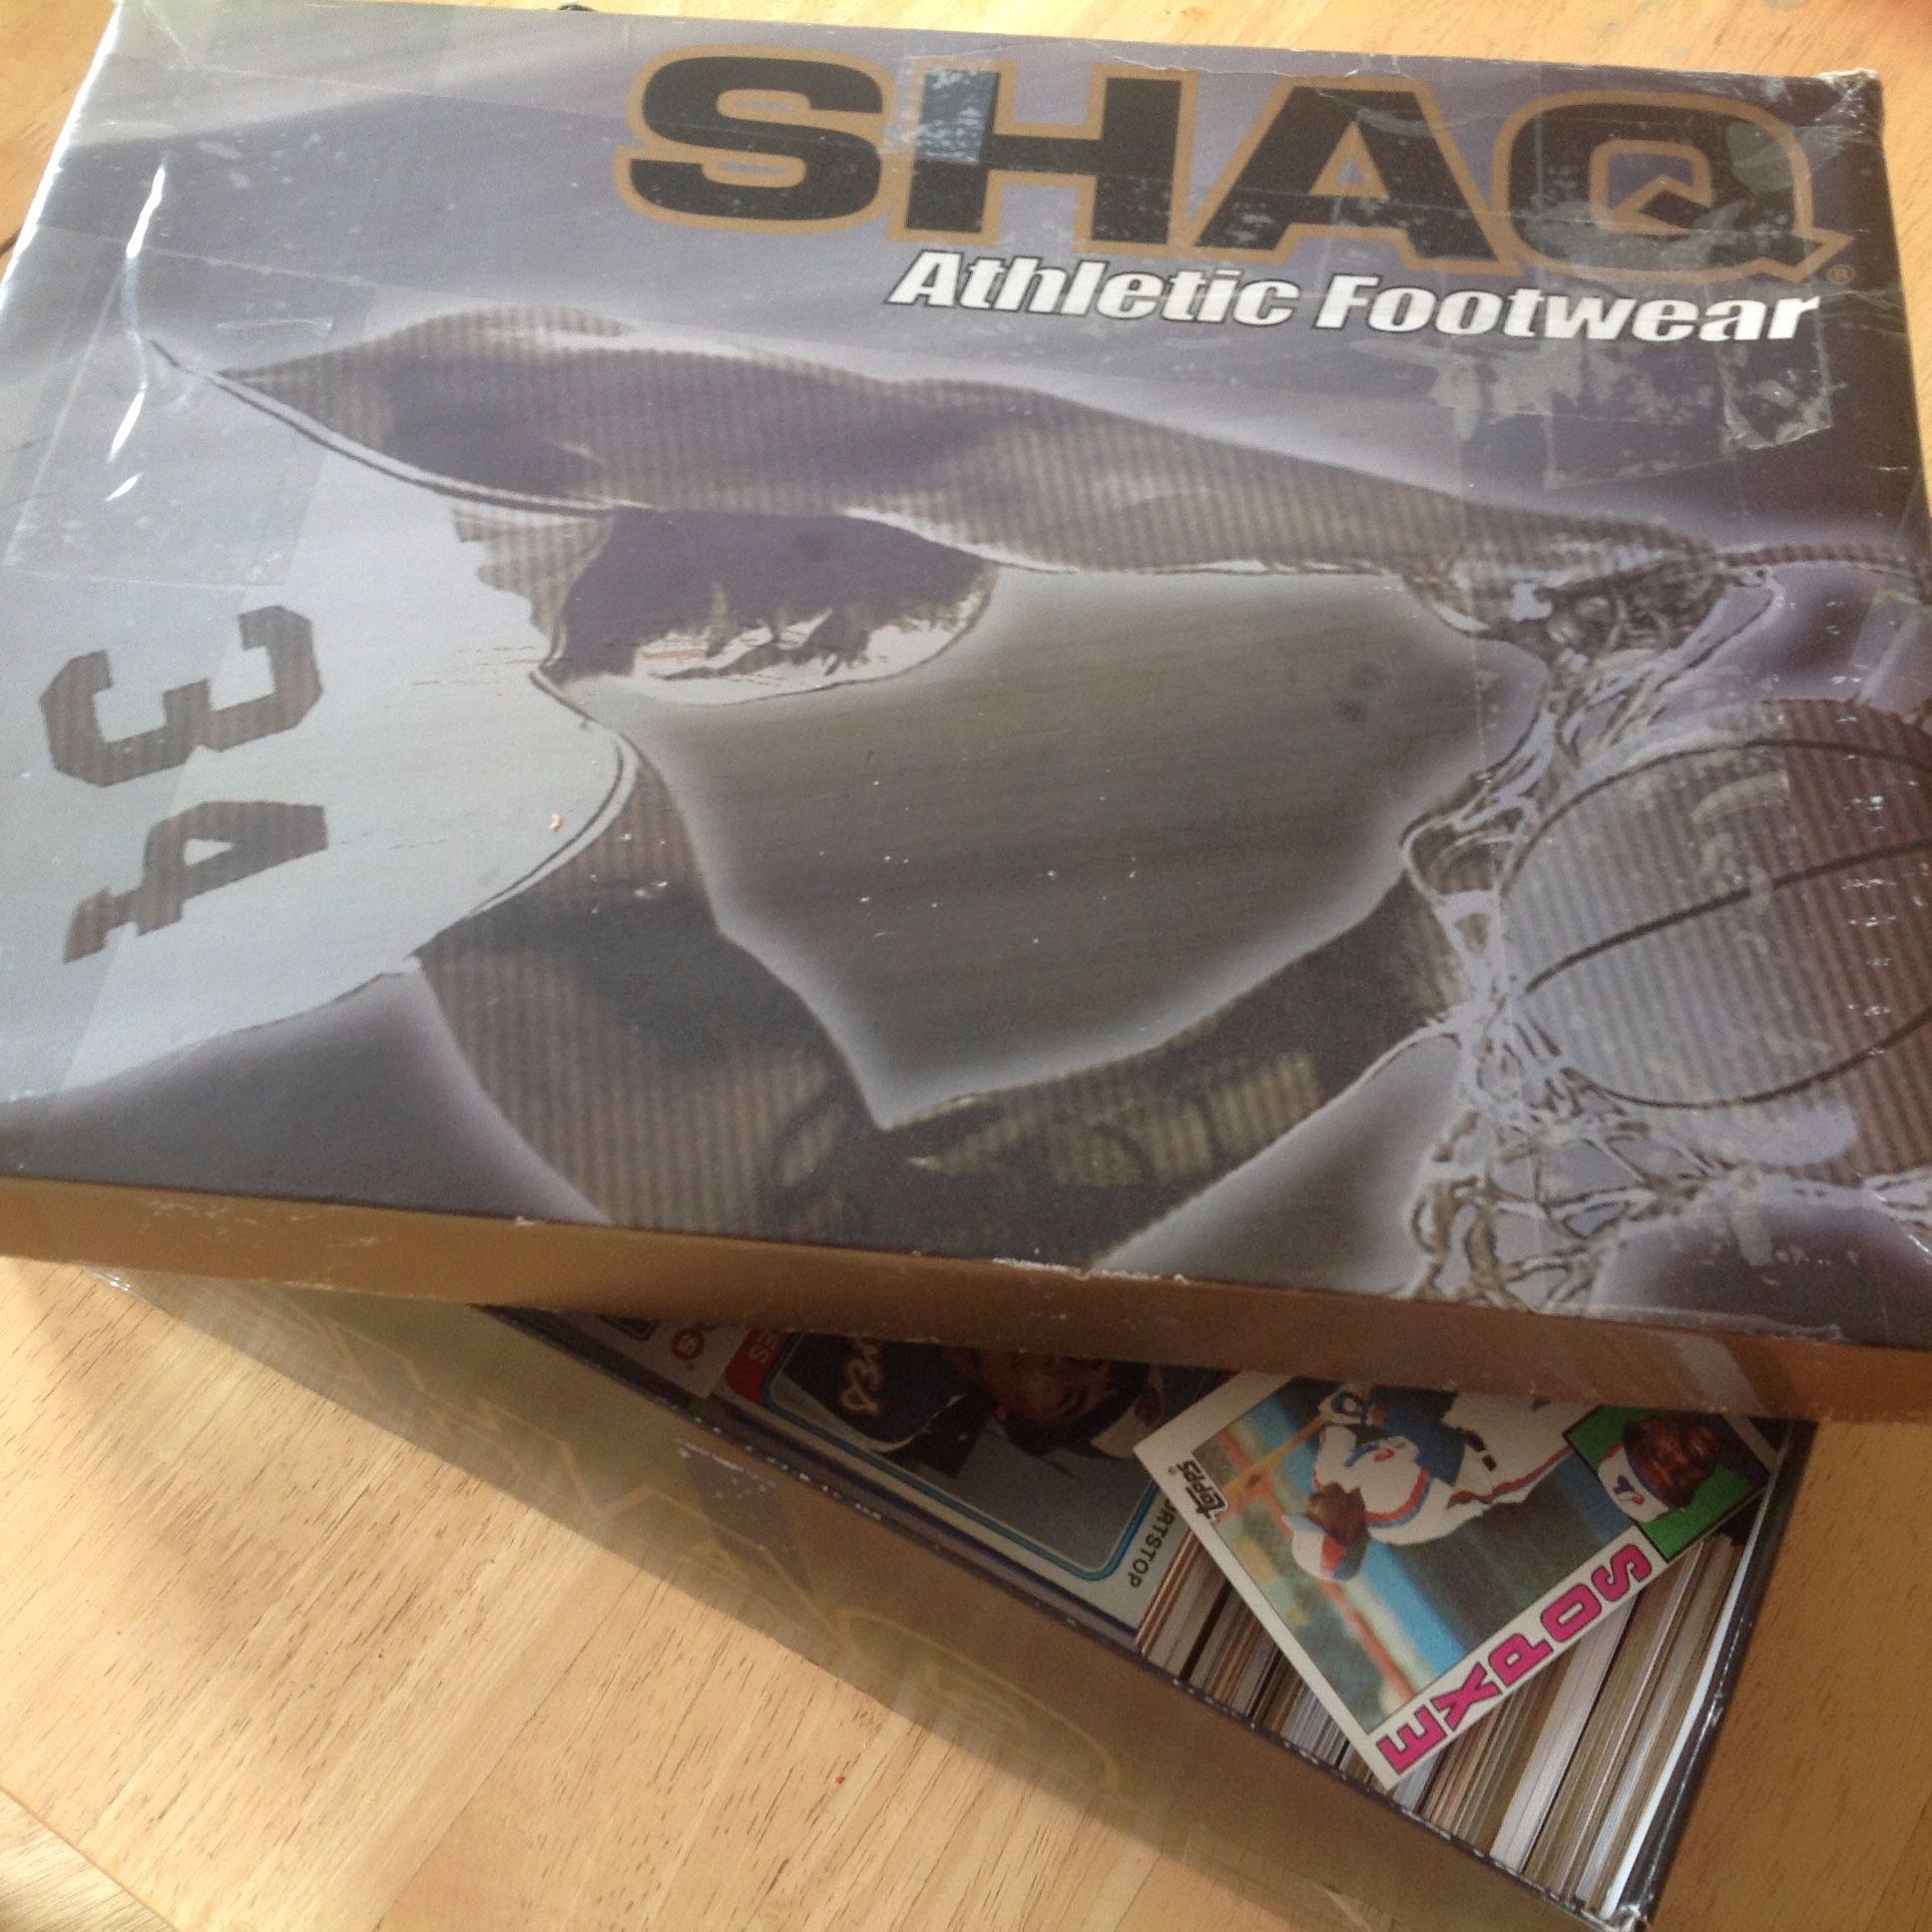 Project ShaqBox